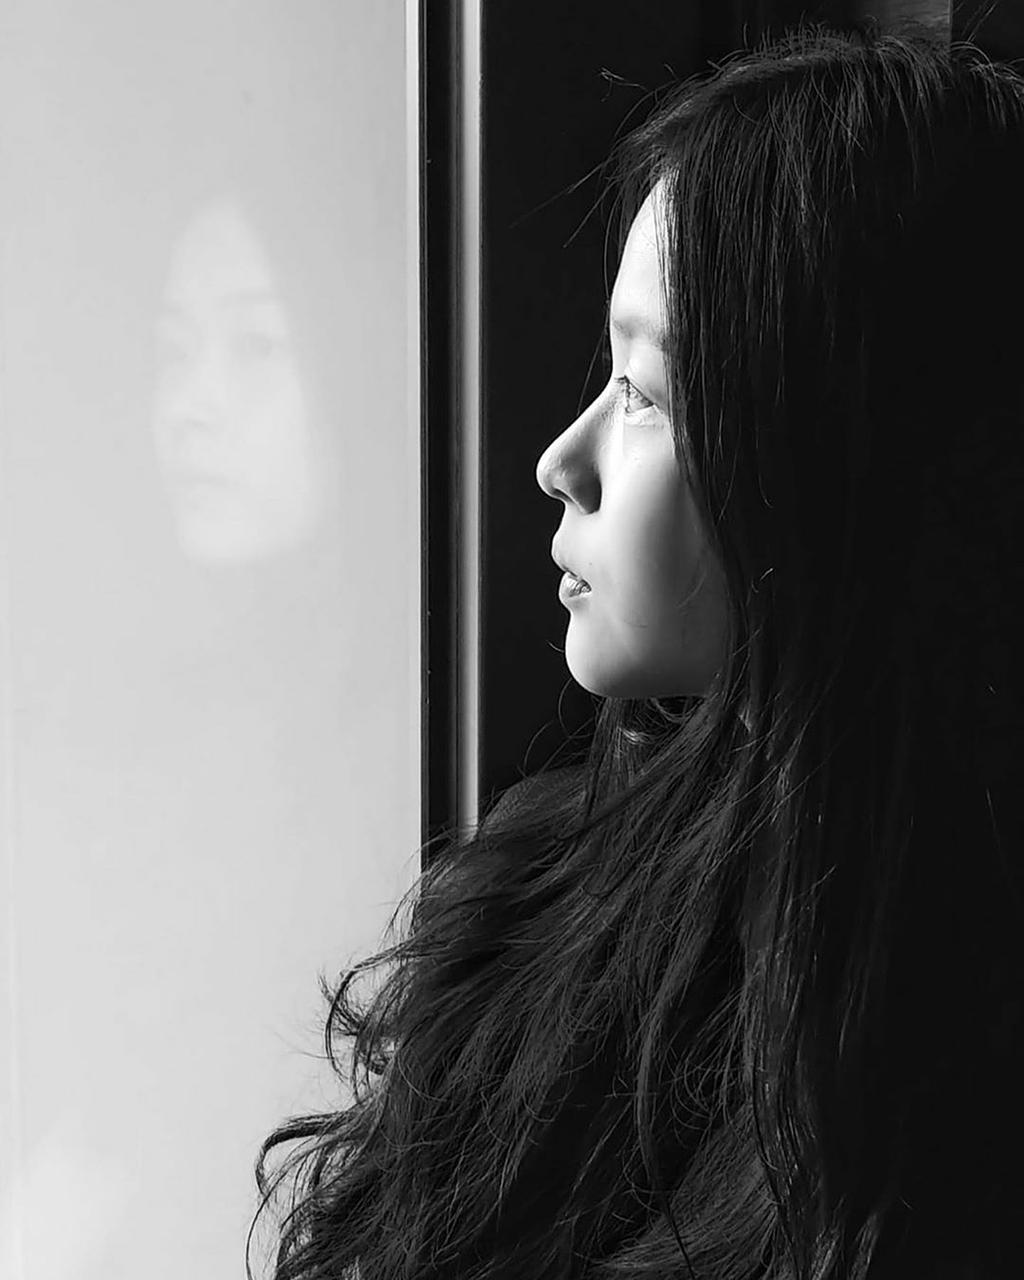 girl, thinking, lonely-4439116.jpg